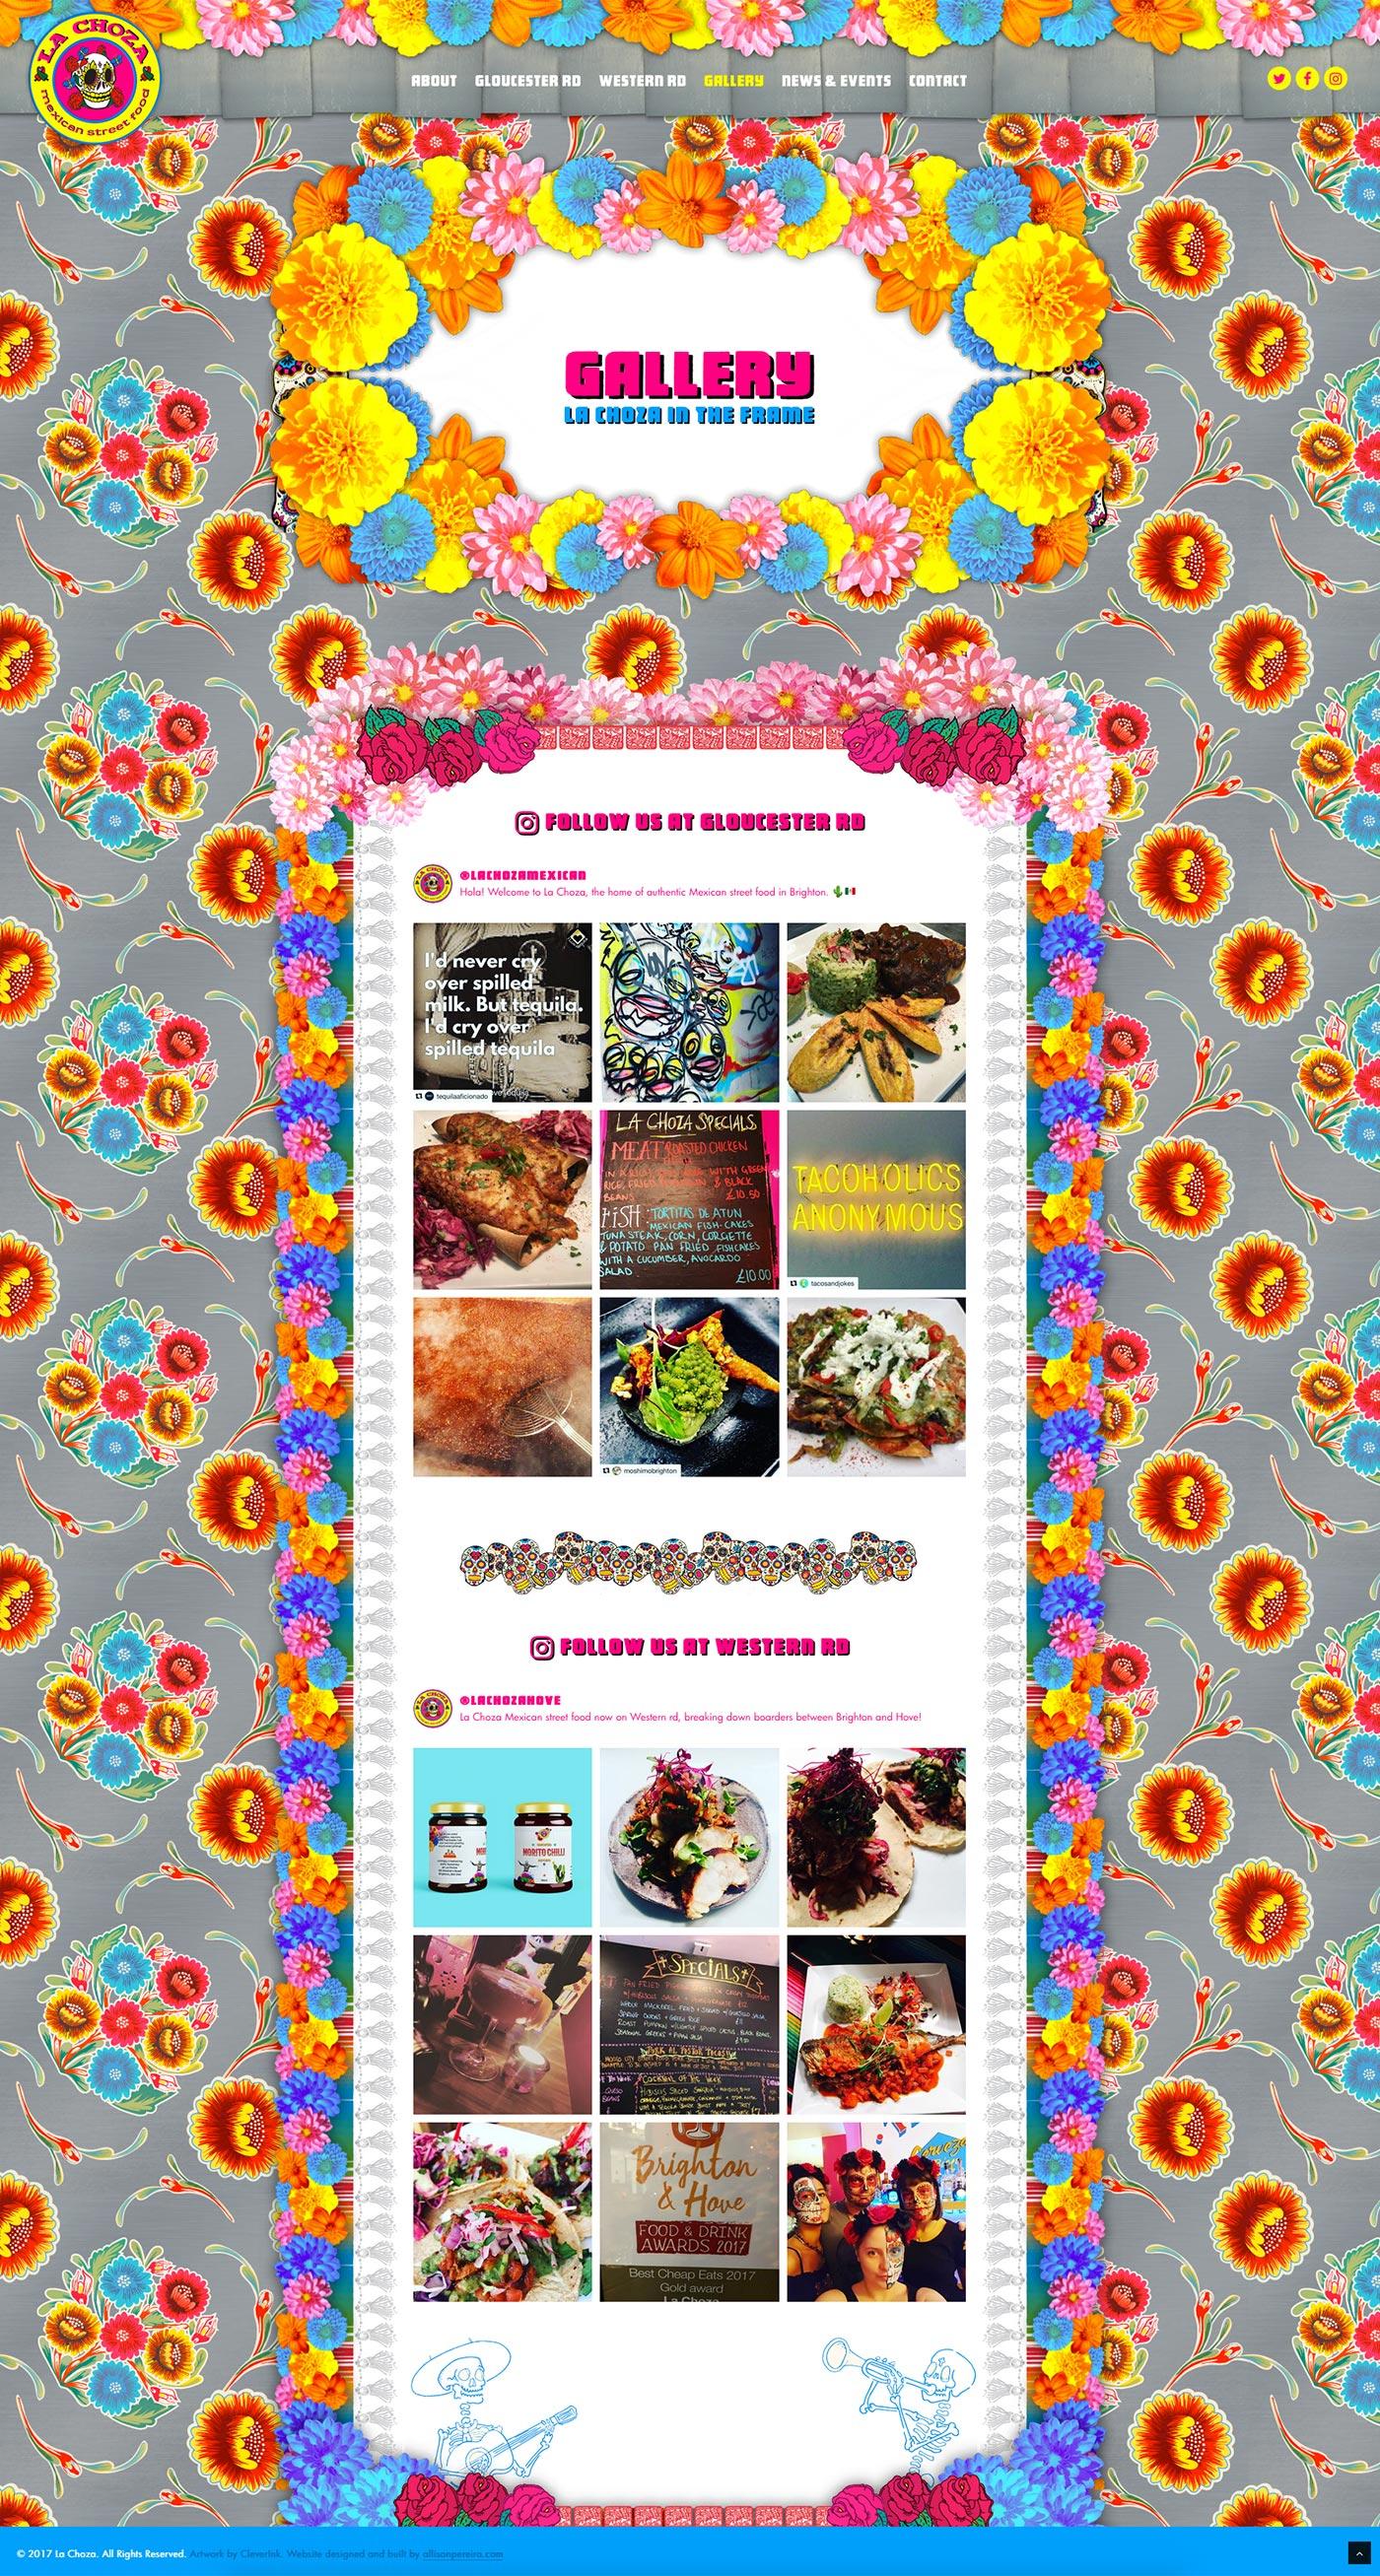 La Choza Mexican street food project work web page